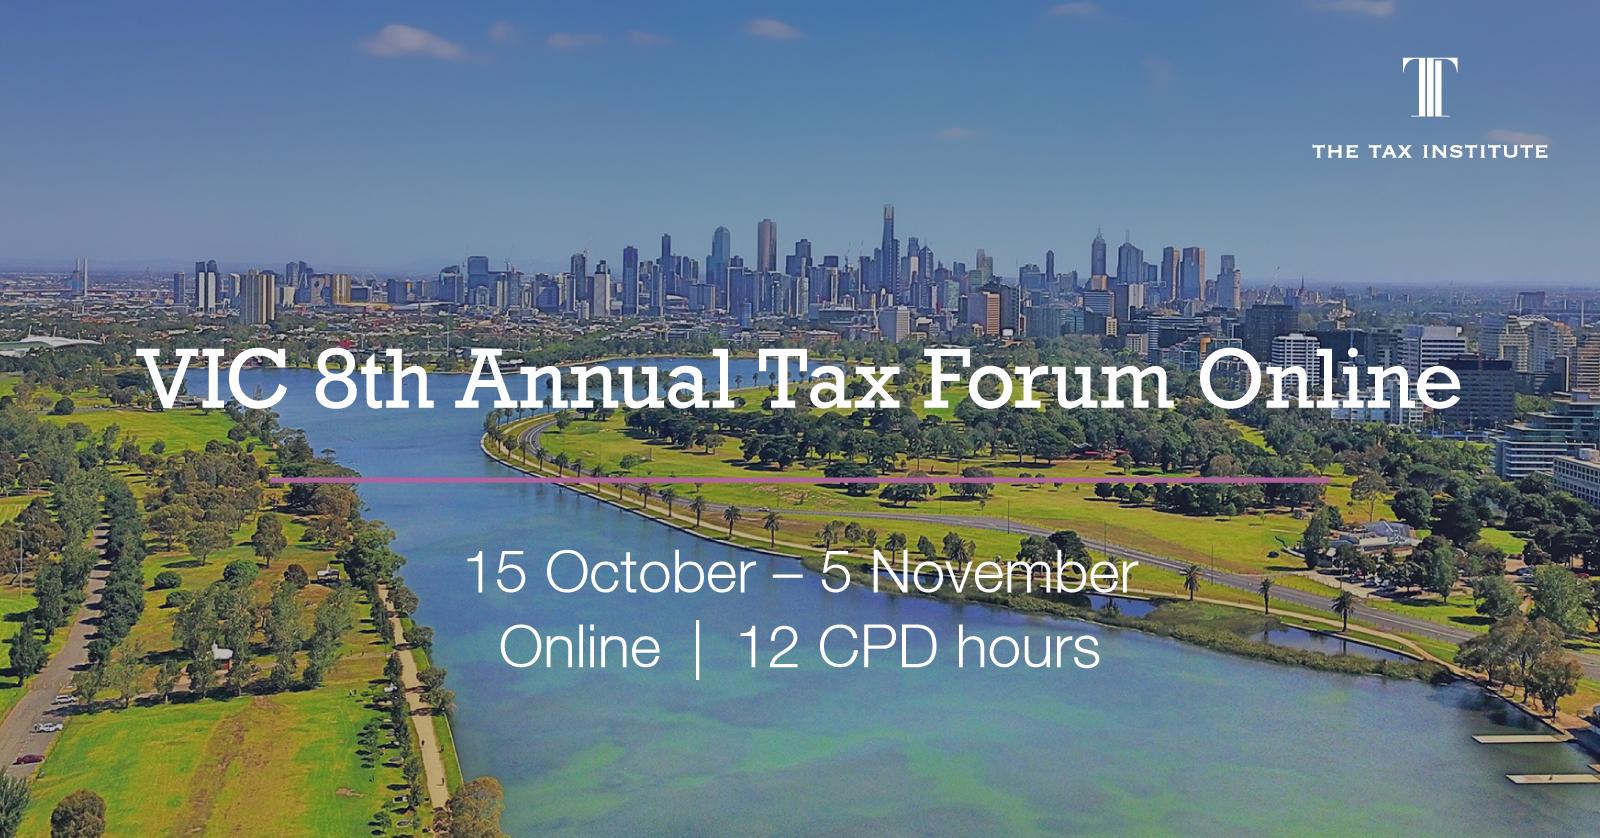 0217VIC_VIC_8th_Annual_Tax_Forum_Facebook-LinkedIn-1200x628-png